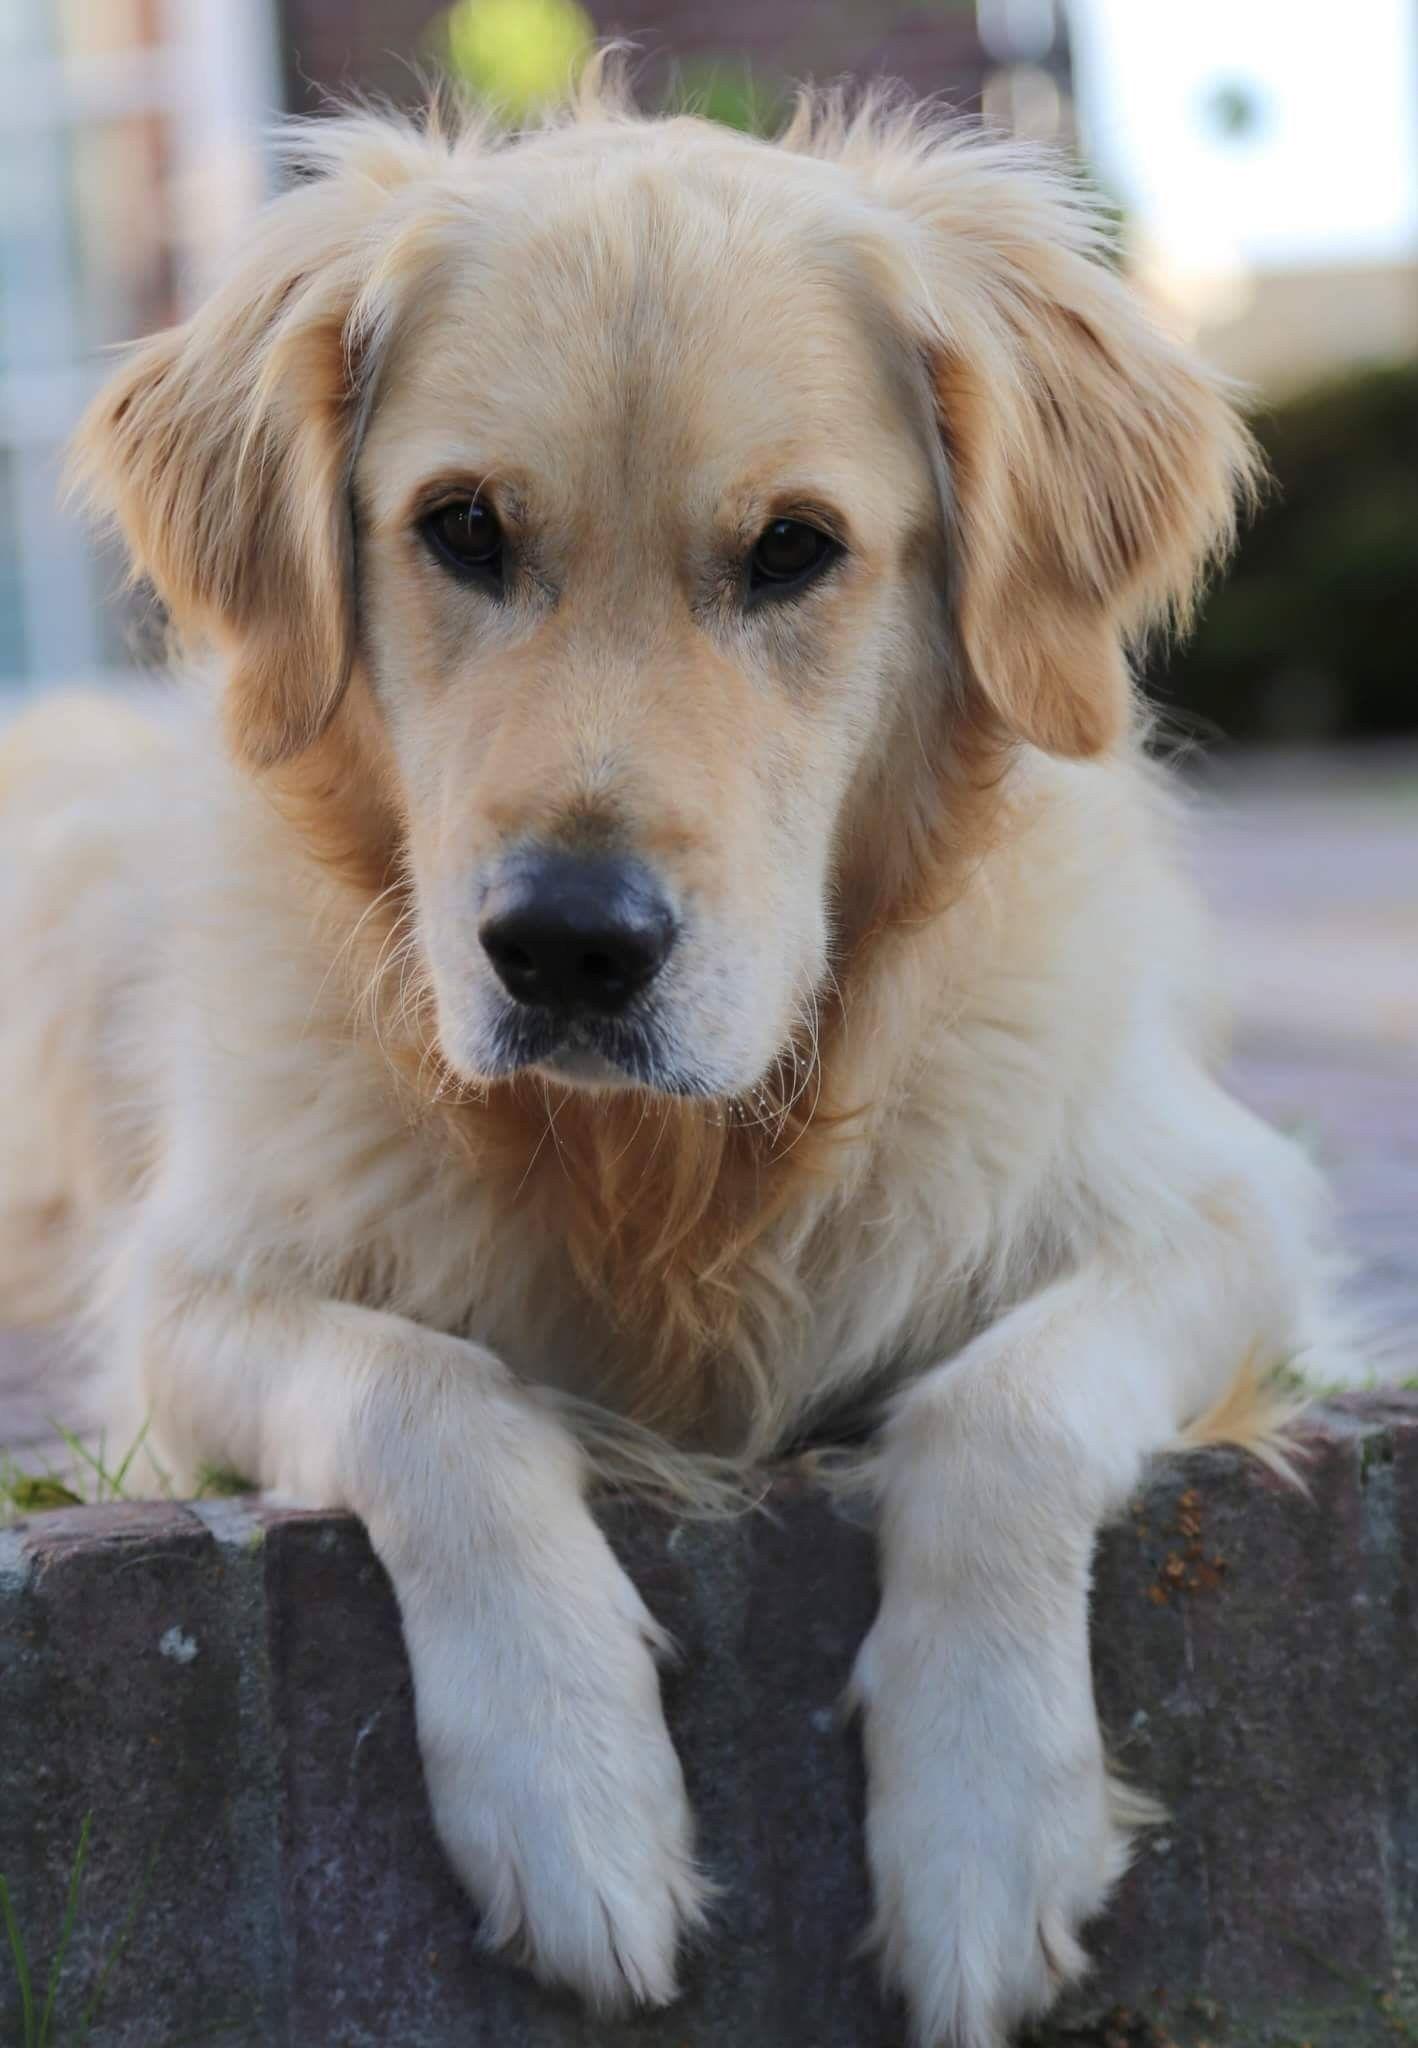 Pin By Corne Snoek On Golden Love Dogs Golden Retriever Animals